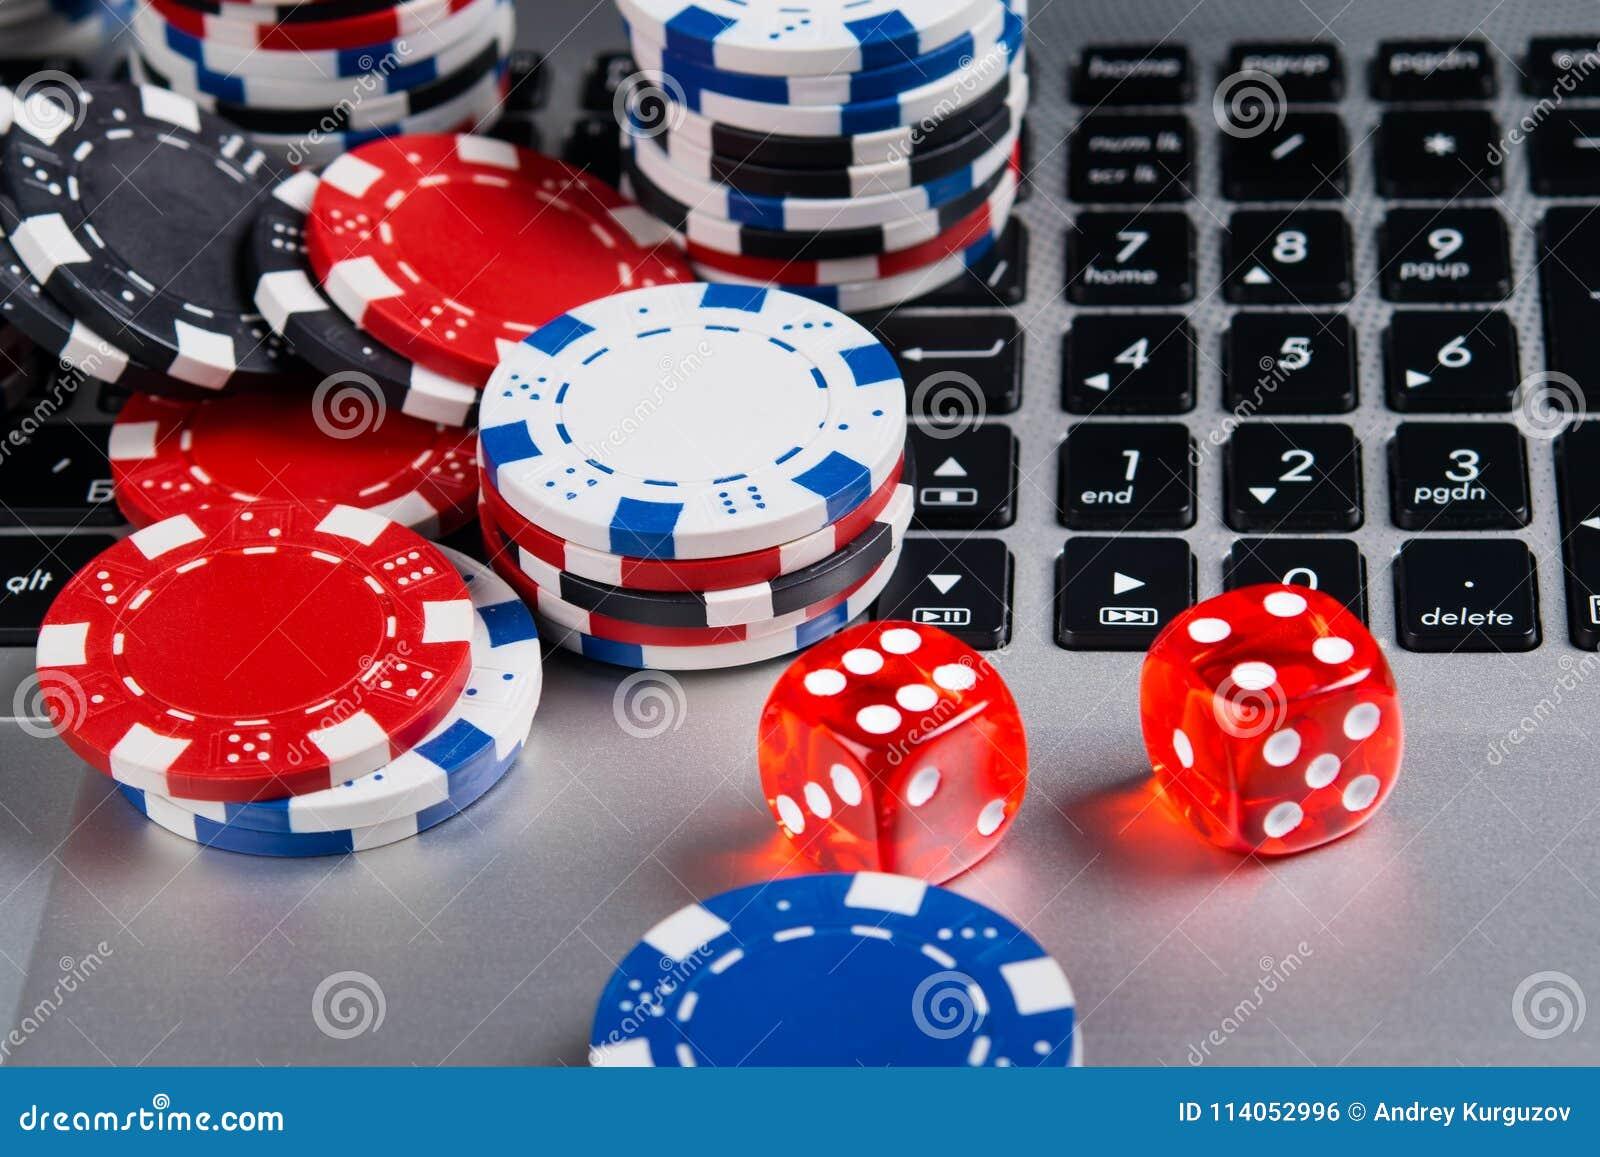 казино c онлайн